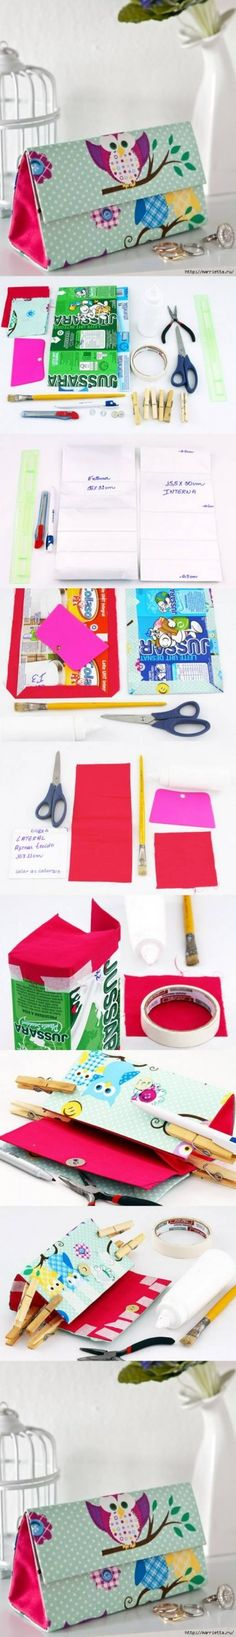 DIY Milk Box Clutch Handbag DIY Projects